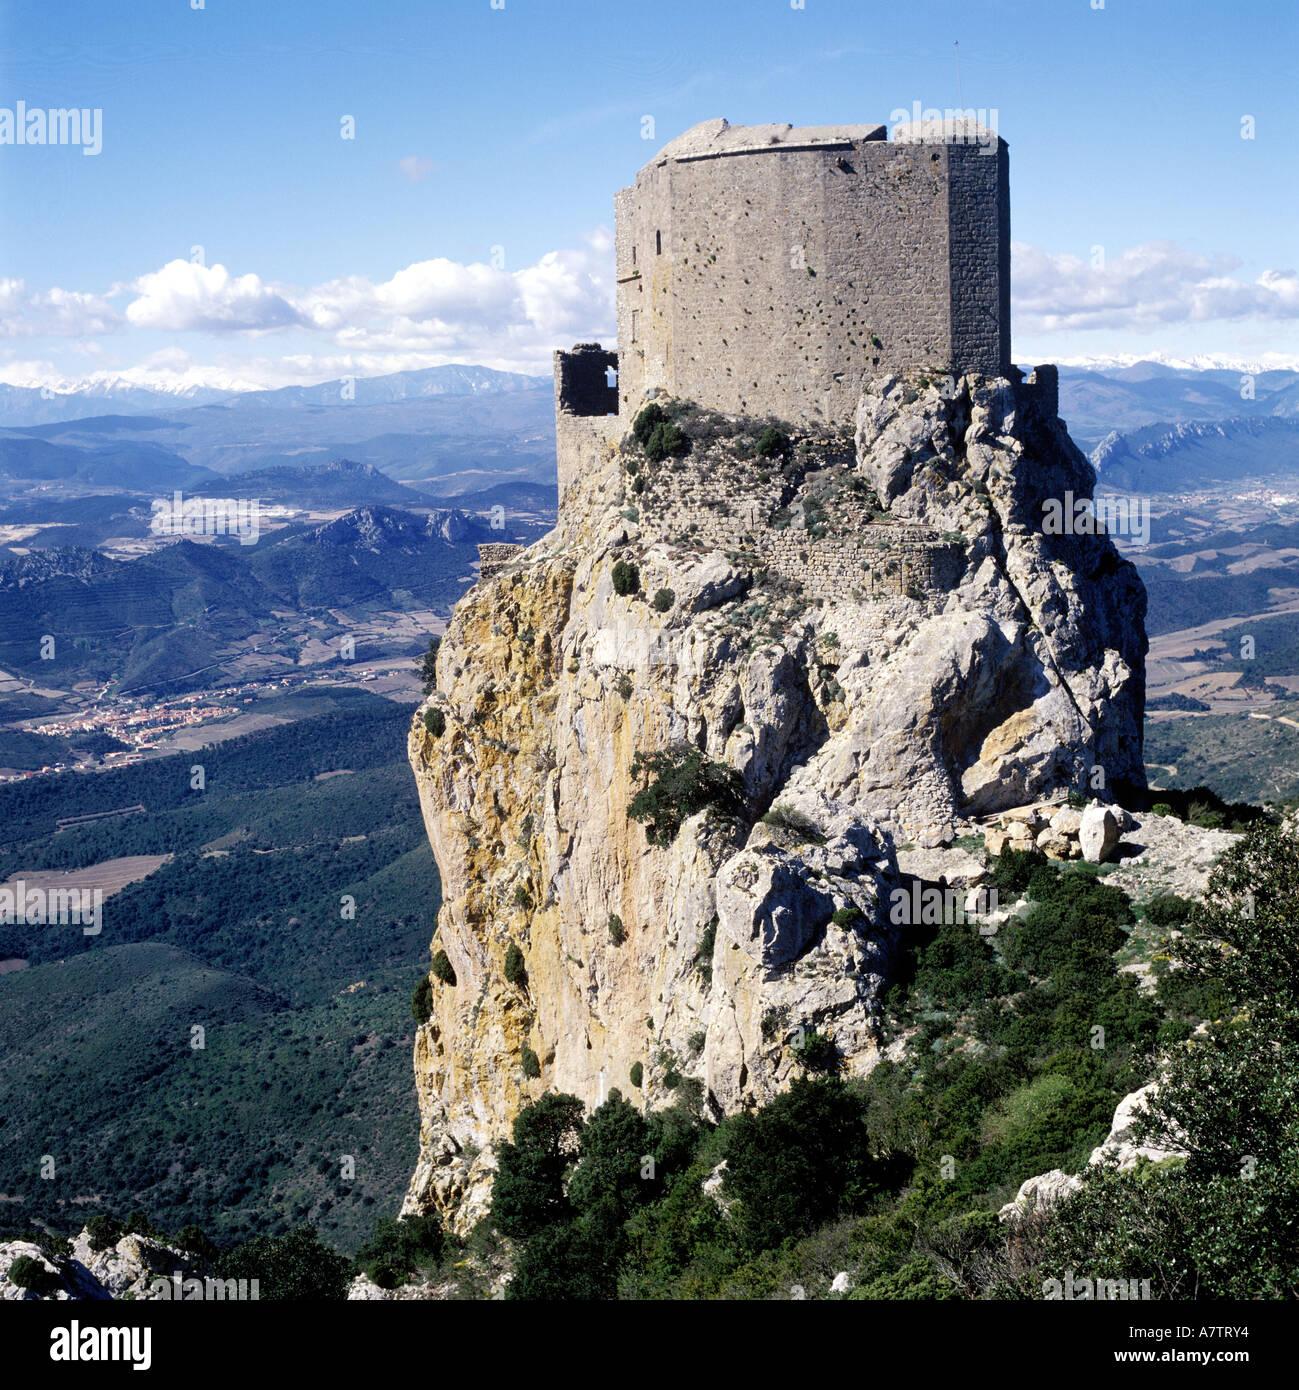 France, Aude, cathar castle of Queribus Stock Photo   Alamy